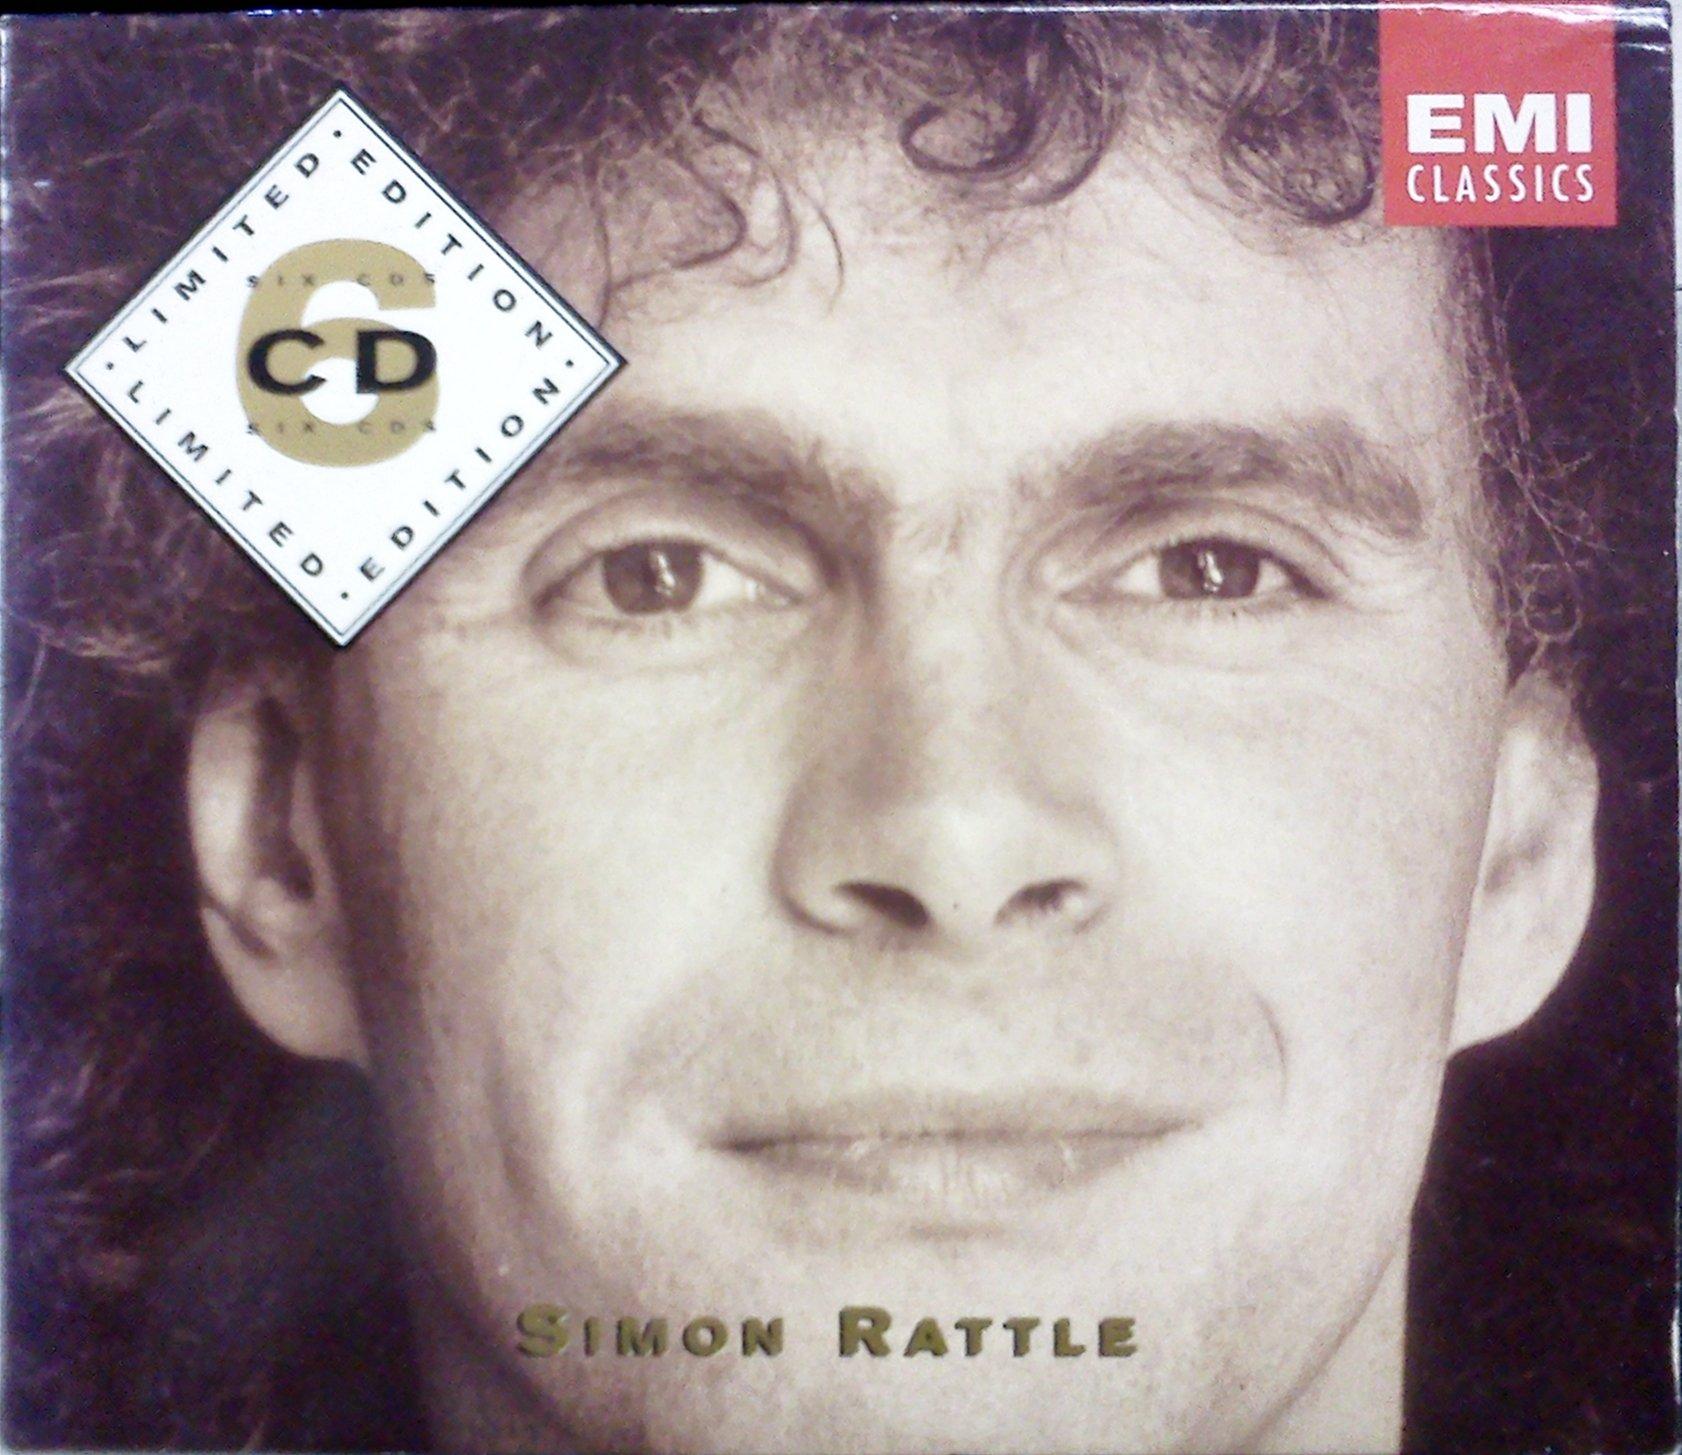 Simon Rattle: 20th Century Orchestral Masterworks